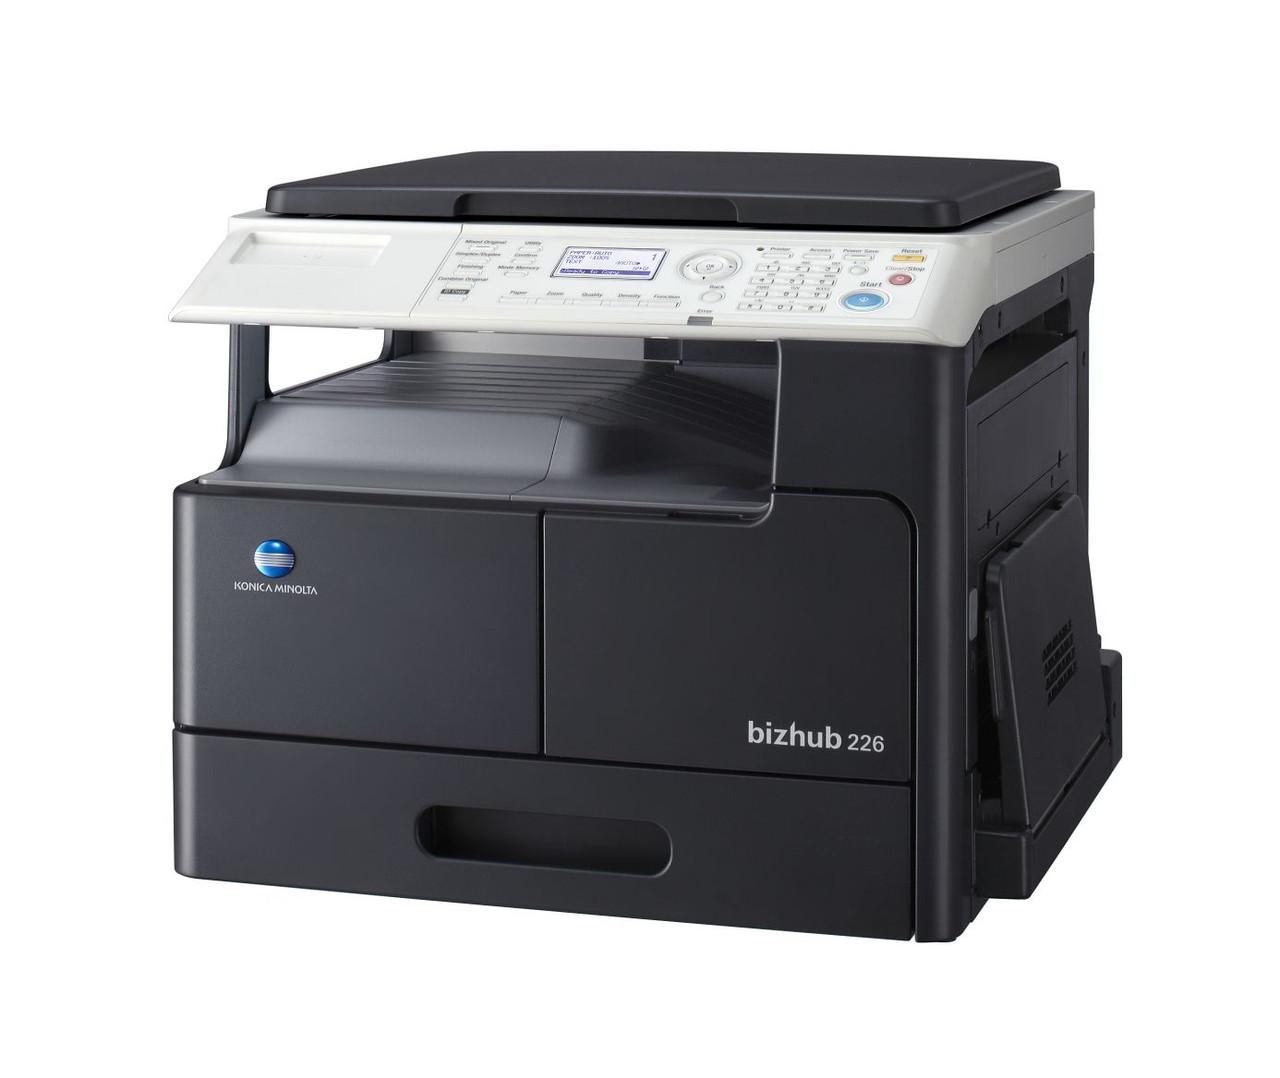 Konica Minolta bizhub 226, монохромное МФУ, А3, 22 стр./мин, копир, сетевой принтер, сканер, дуплекс.